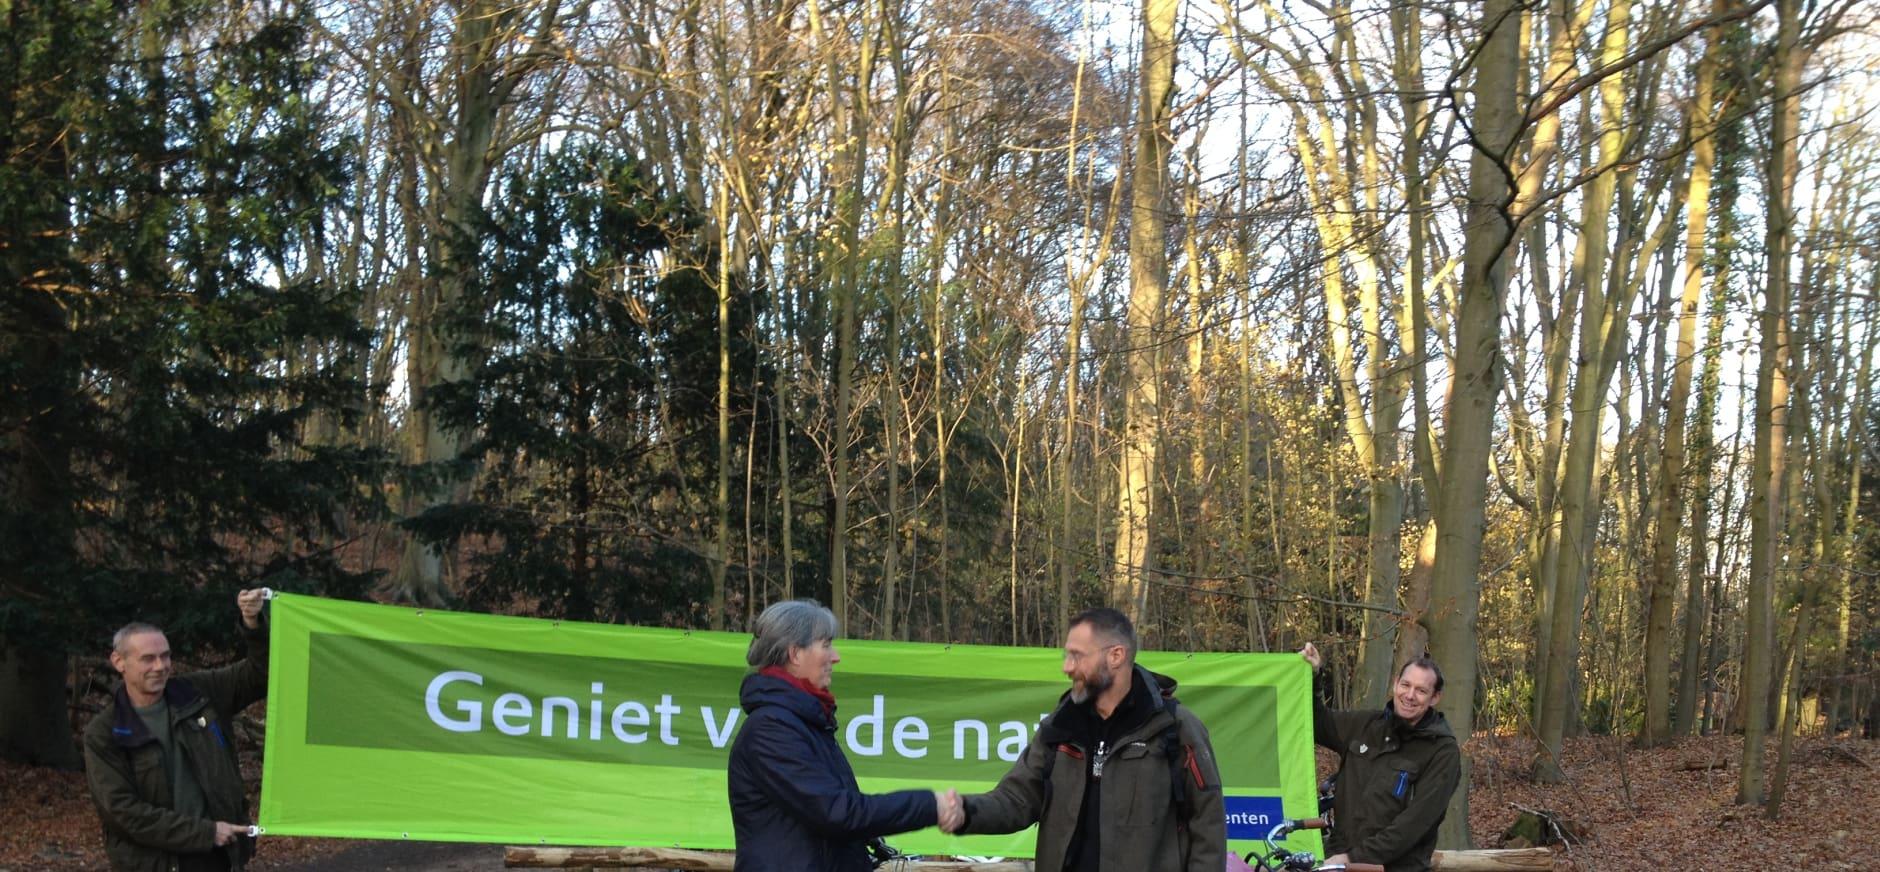 Nieuwe fietsenrekken Nationaal Park Zuid-Kennemerland